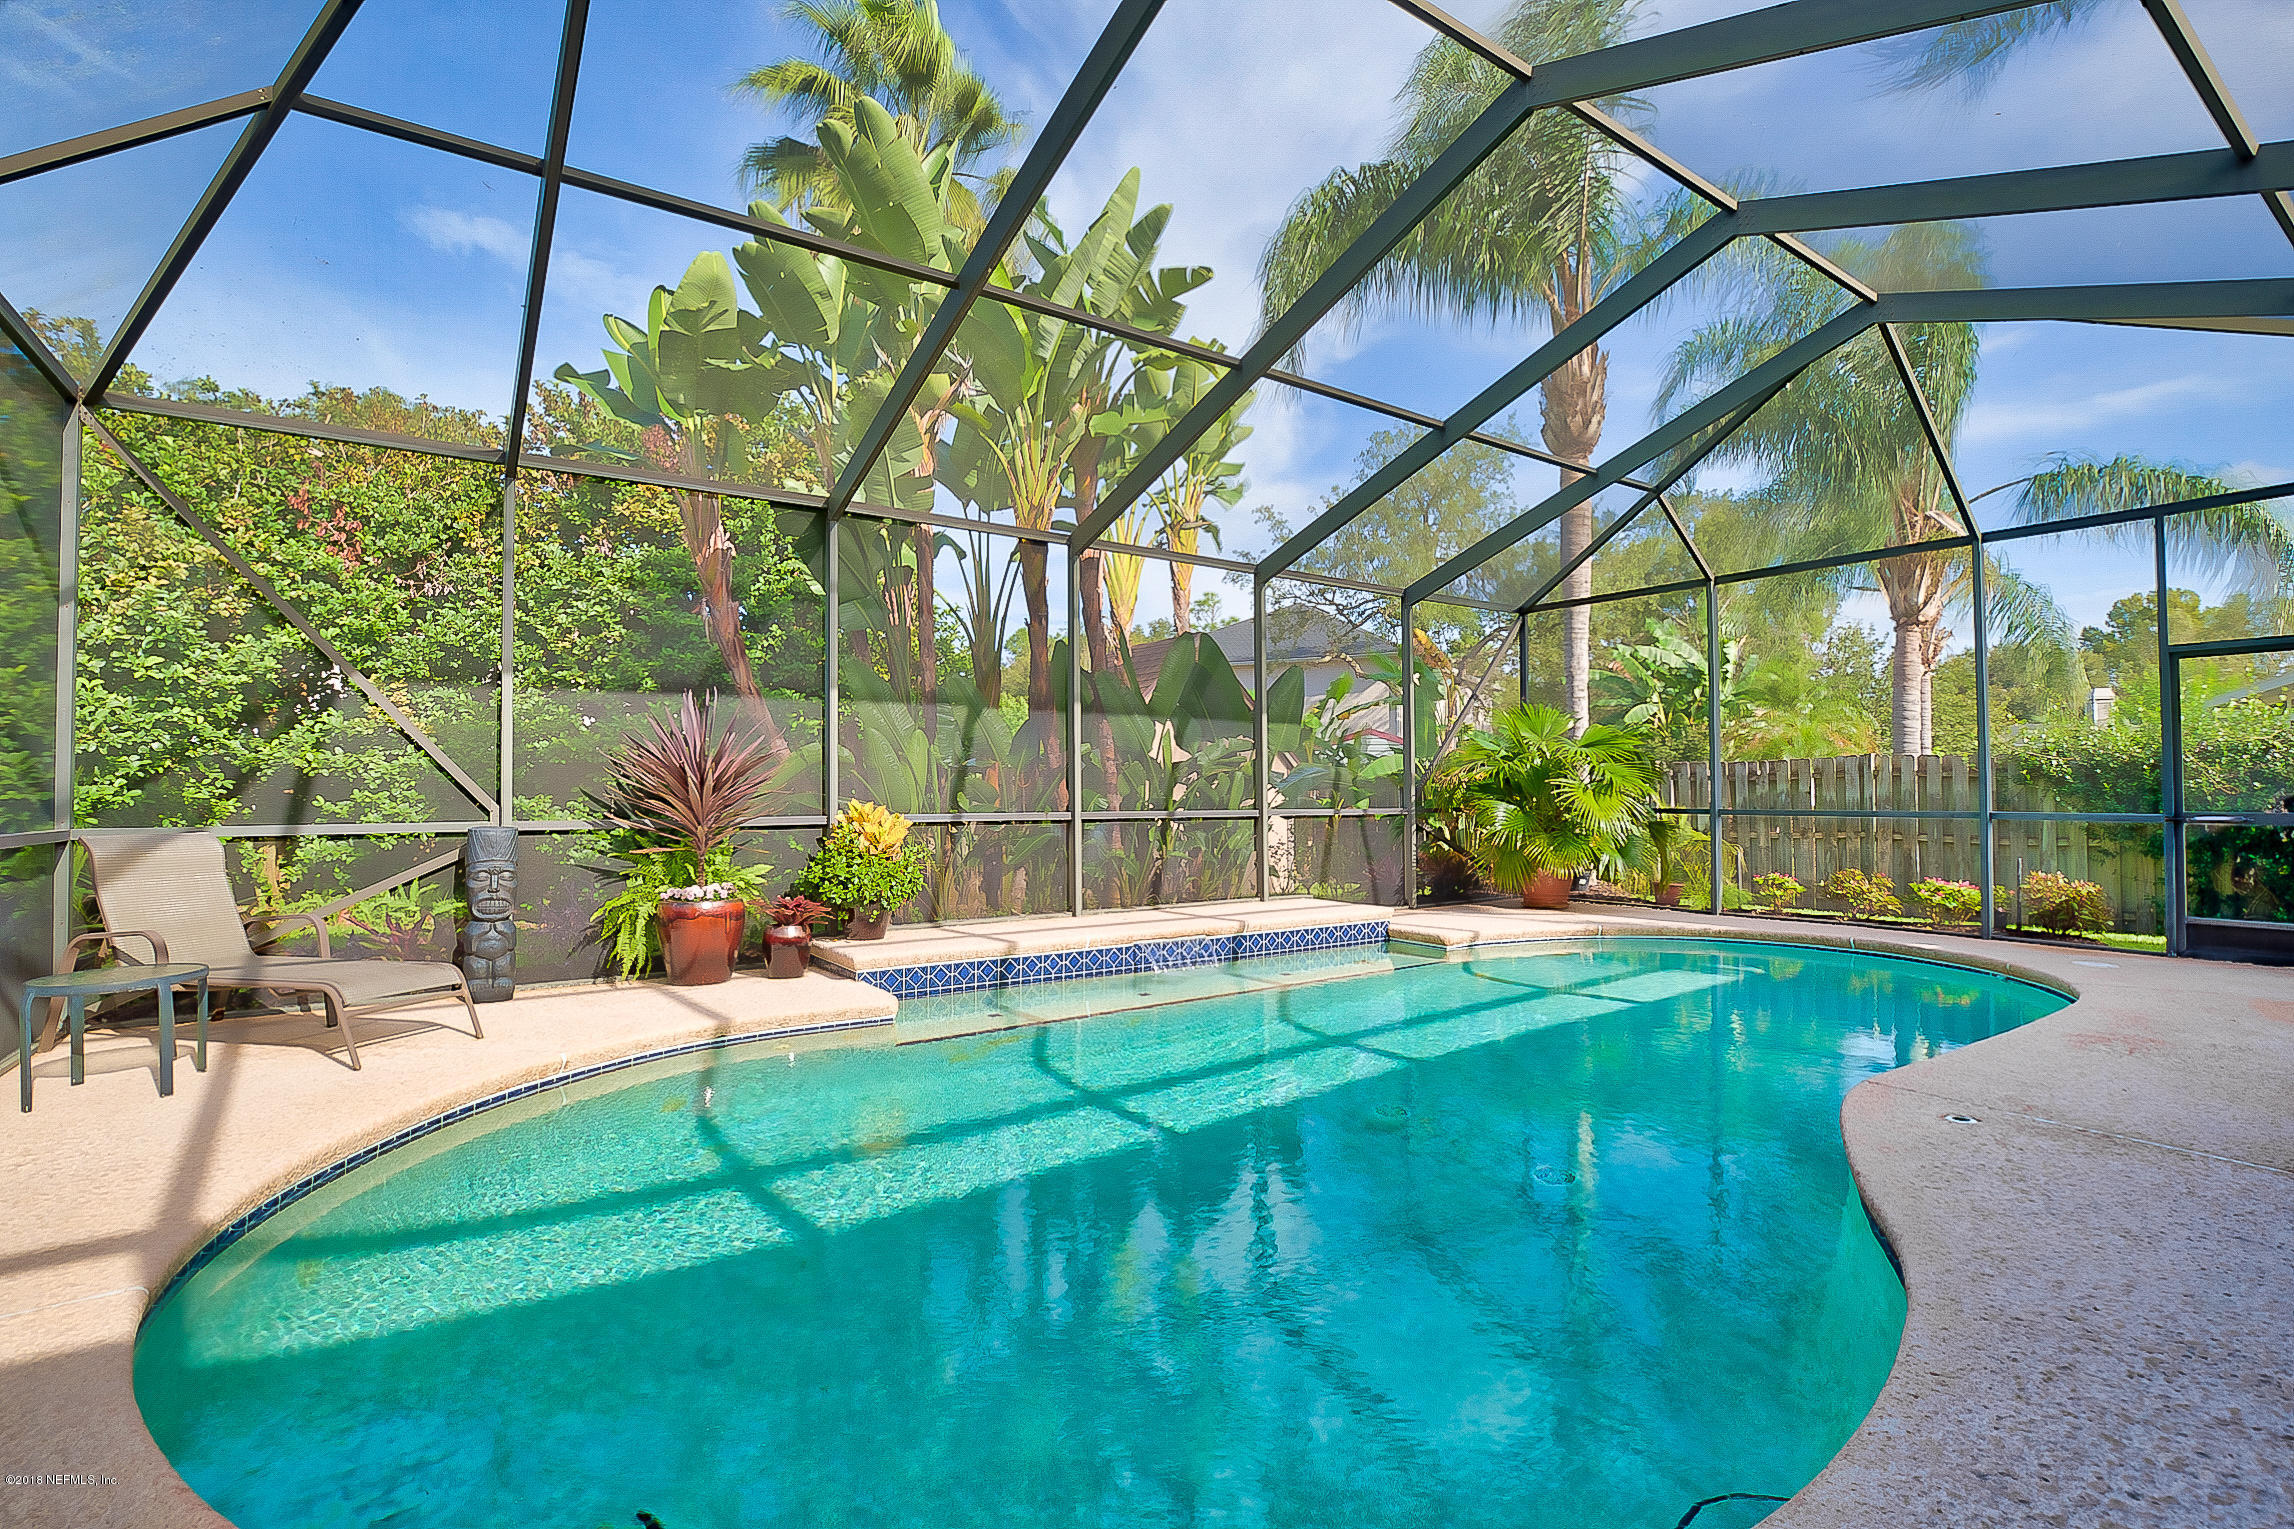 1185 LAKE PARKE, JACKSONVILLE, FLORIDA 32259, 5 Bedrooms Bedrooms, ,3 BathroomsBathrooms,Residential - single family,For sale,LAKE PARKE,960417